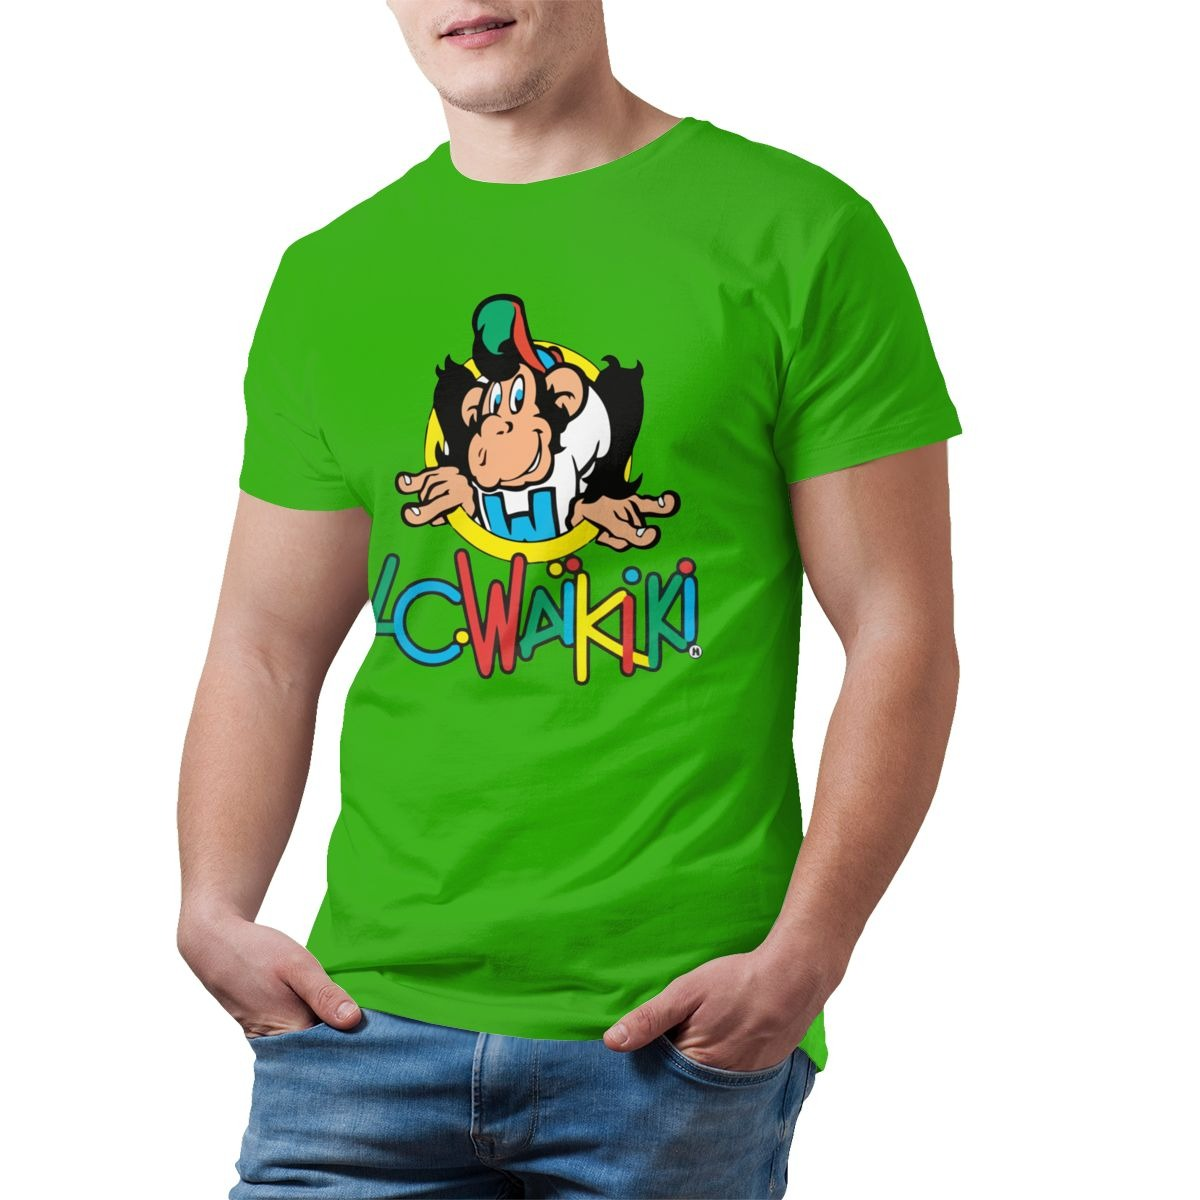 top monkey t shirt lc waikiki monkey merchandise t shirt graphic cotton tee shirt mens short sleeves beach tshirt print casual 3858 - PewDiePie Merch